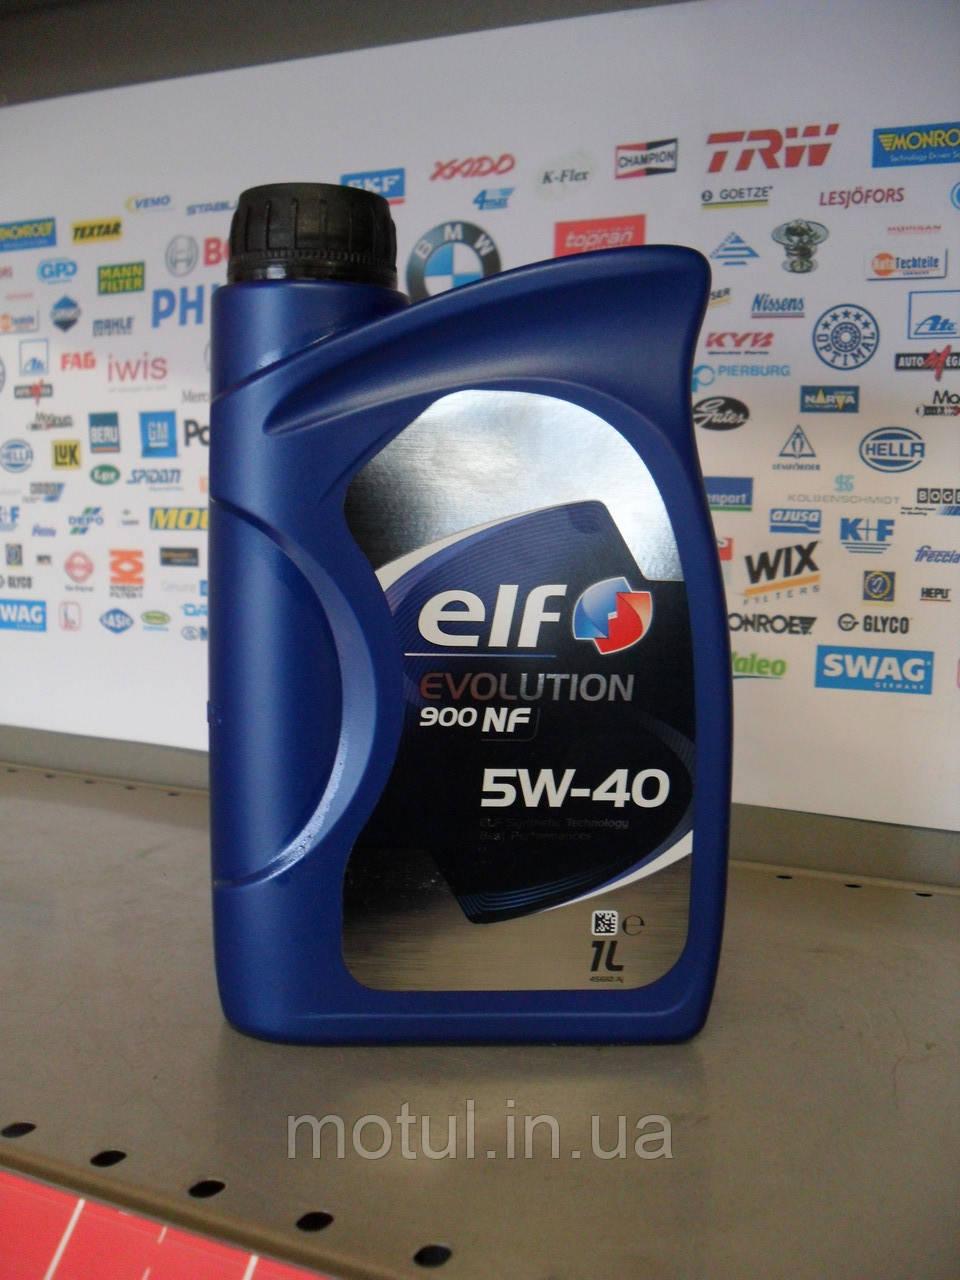 Моторне масло Elf Evolution 900 nf 5w40